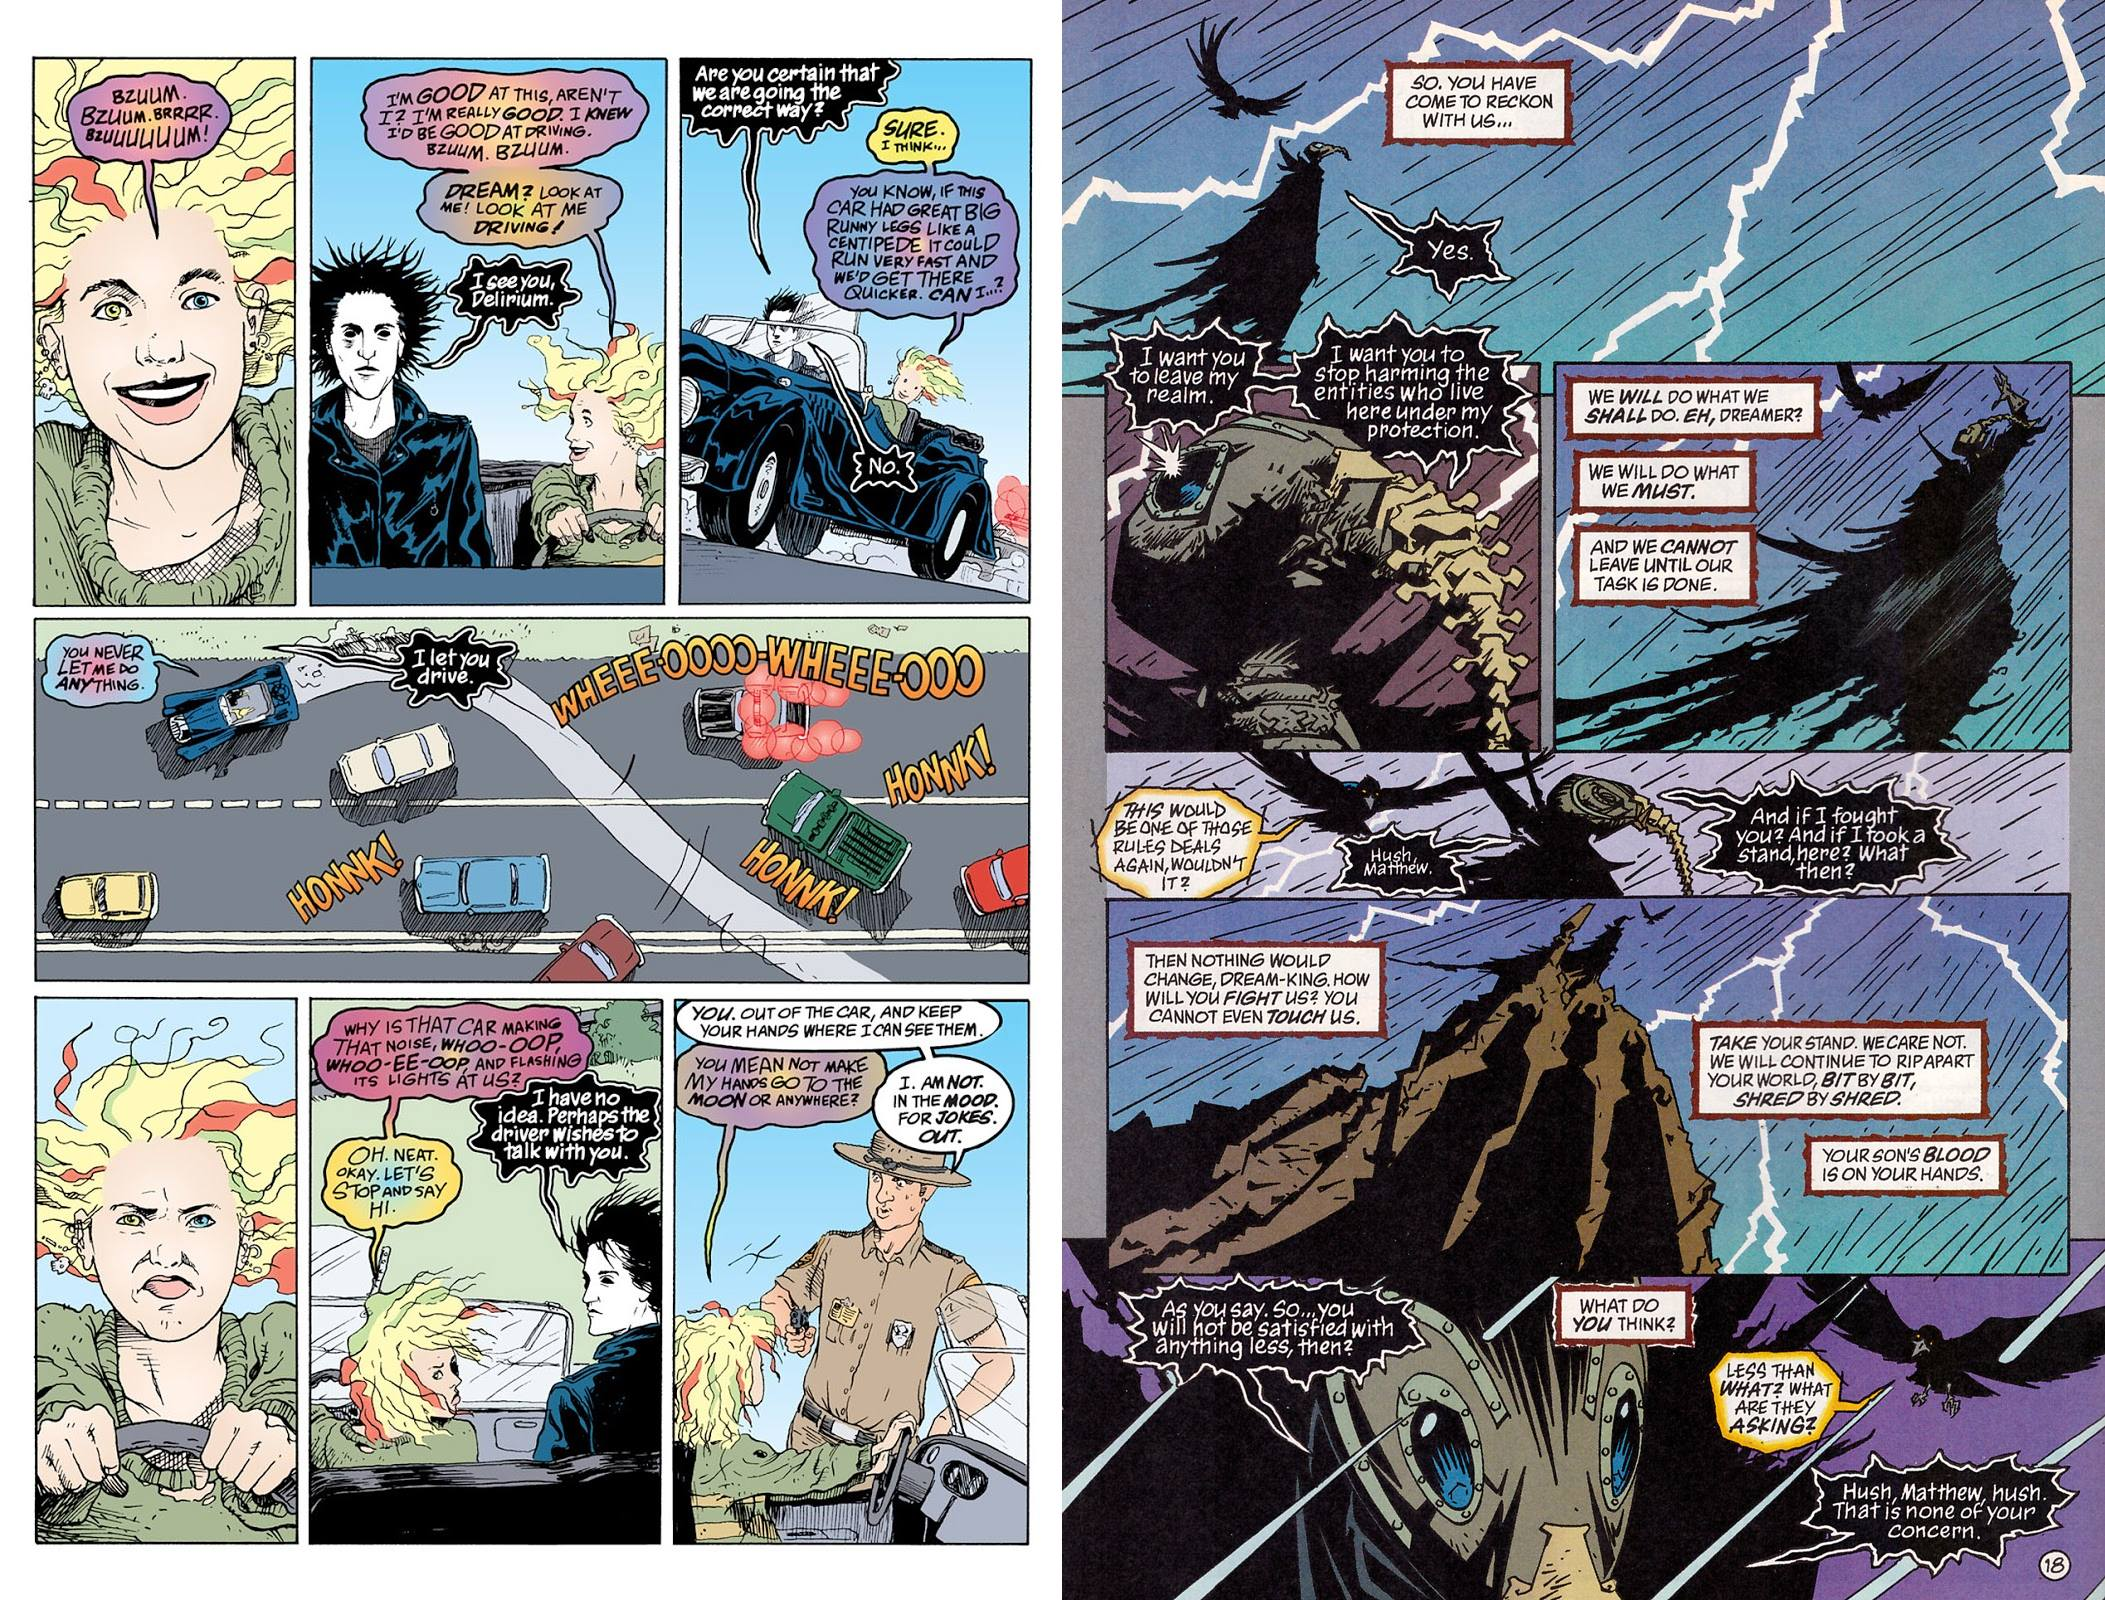 The Sandman Omnibus Vol 2 review